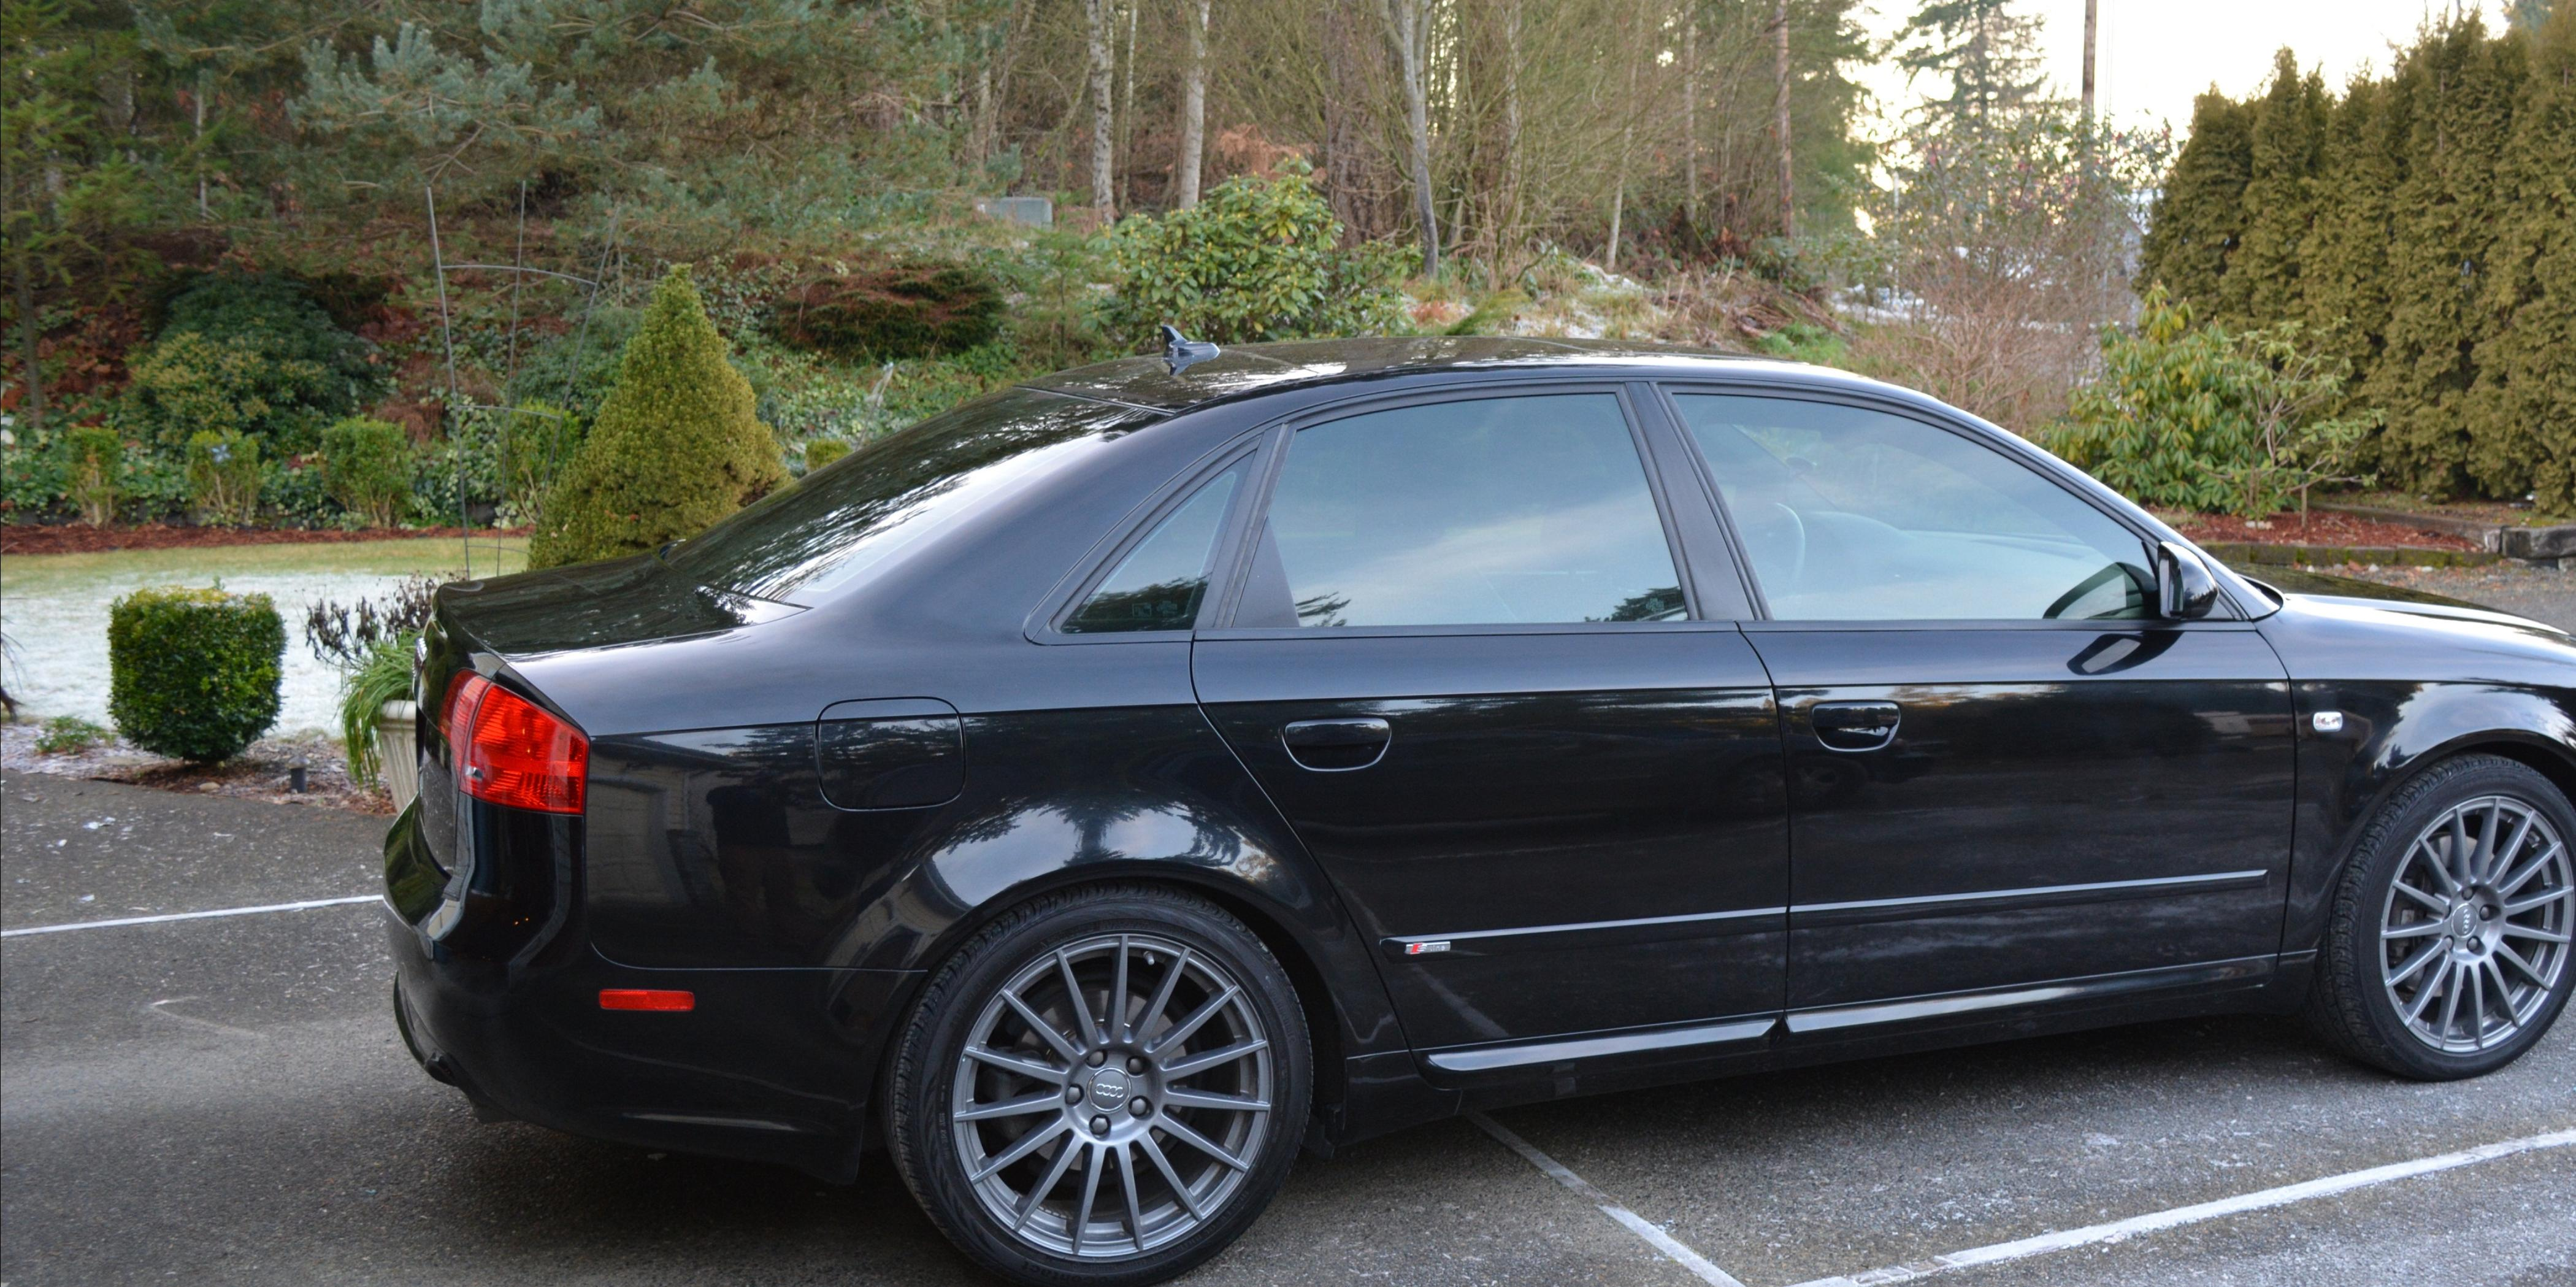 2008 Audi A4 Image 12